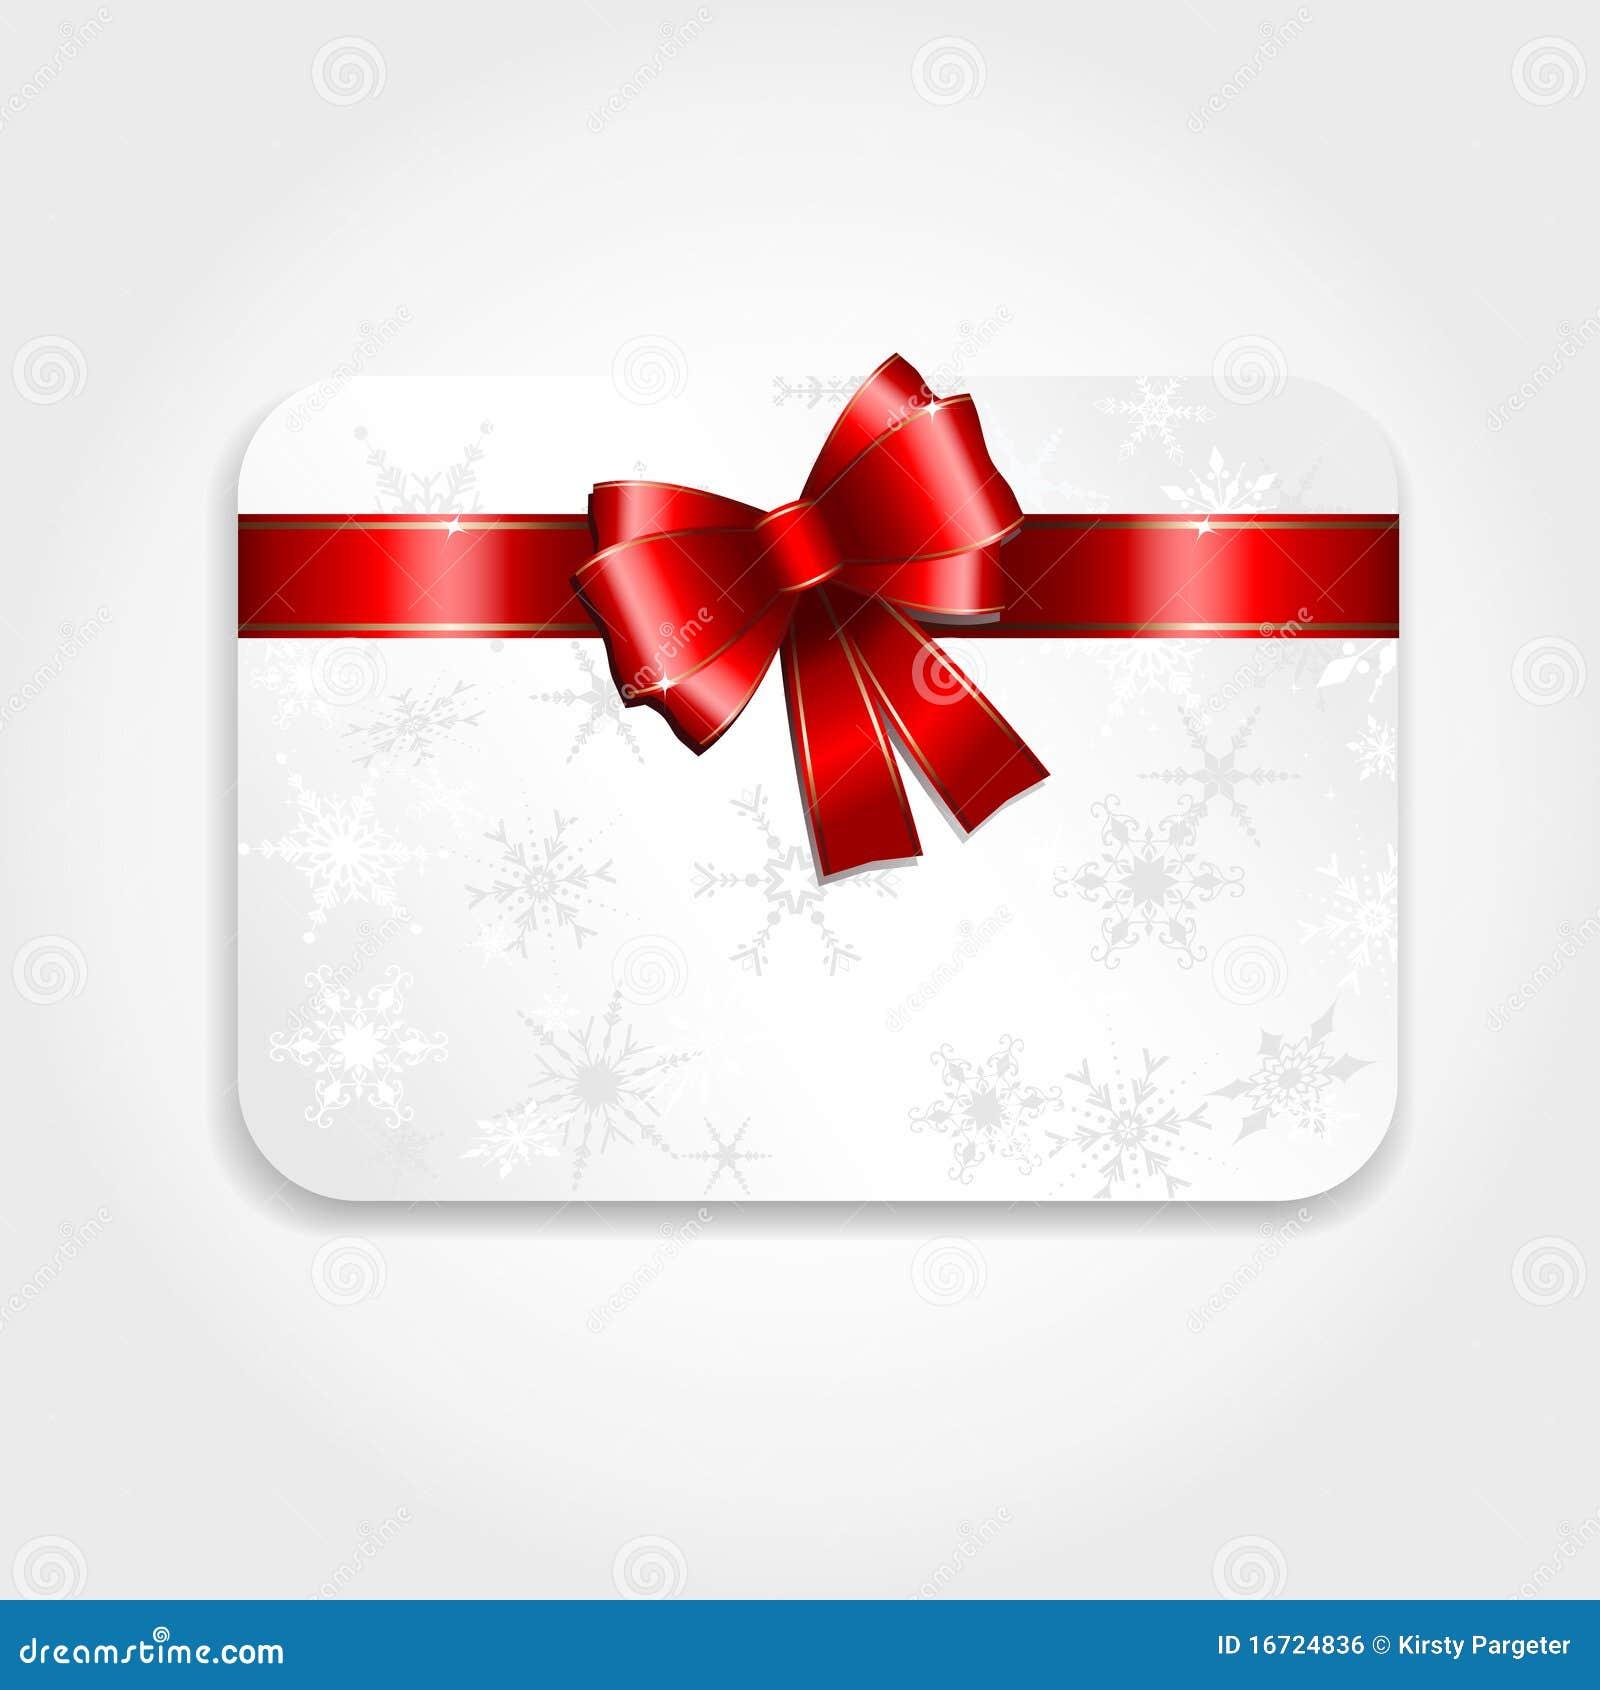 Christmas Gift Card Royalty Free Stock Image - Image: 16724836